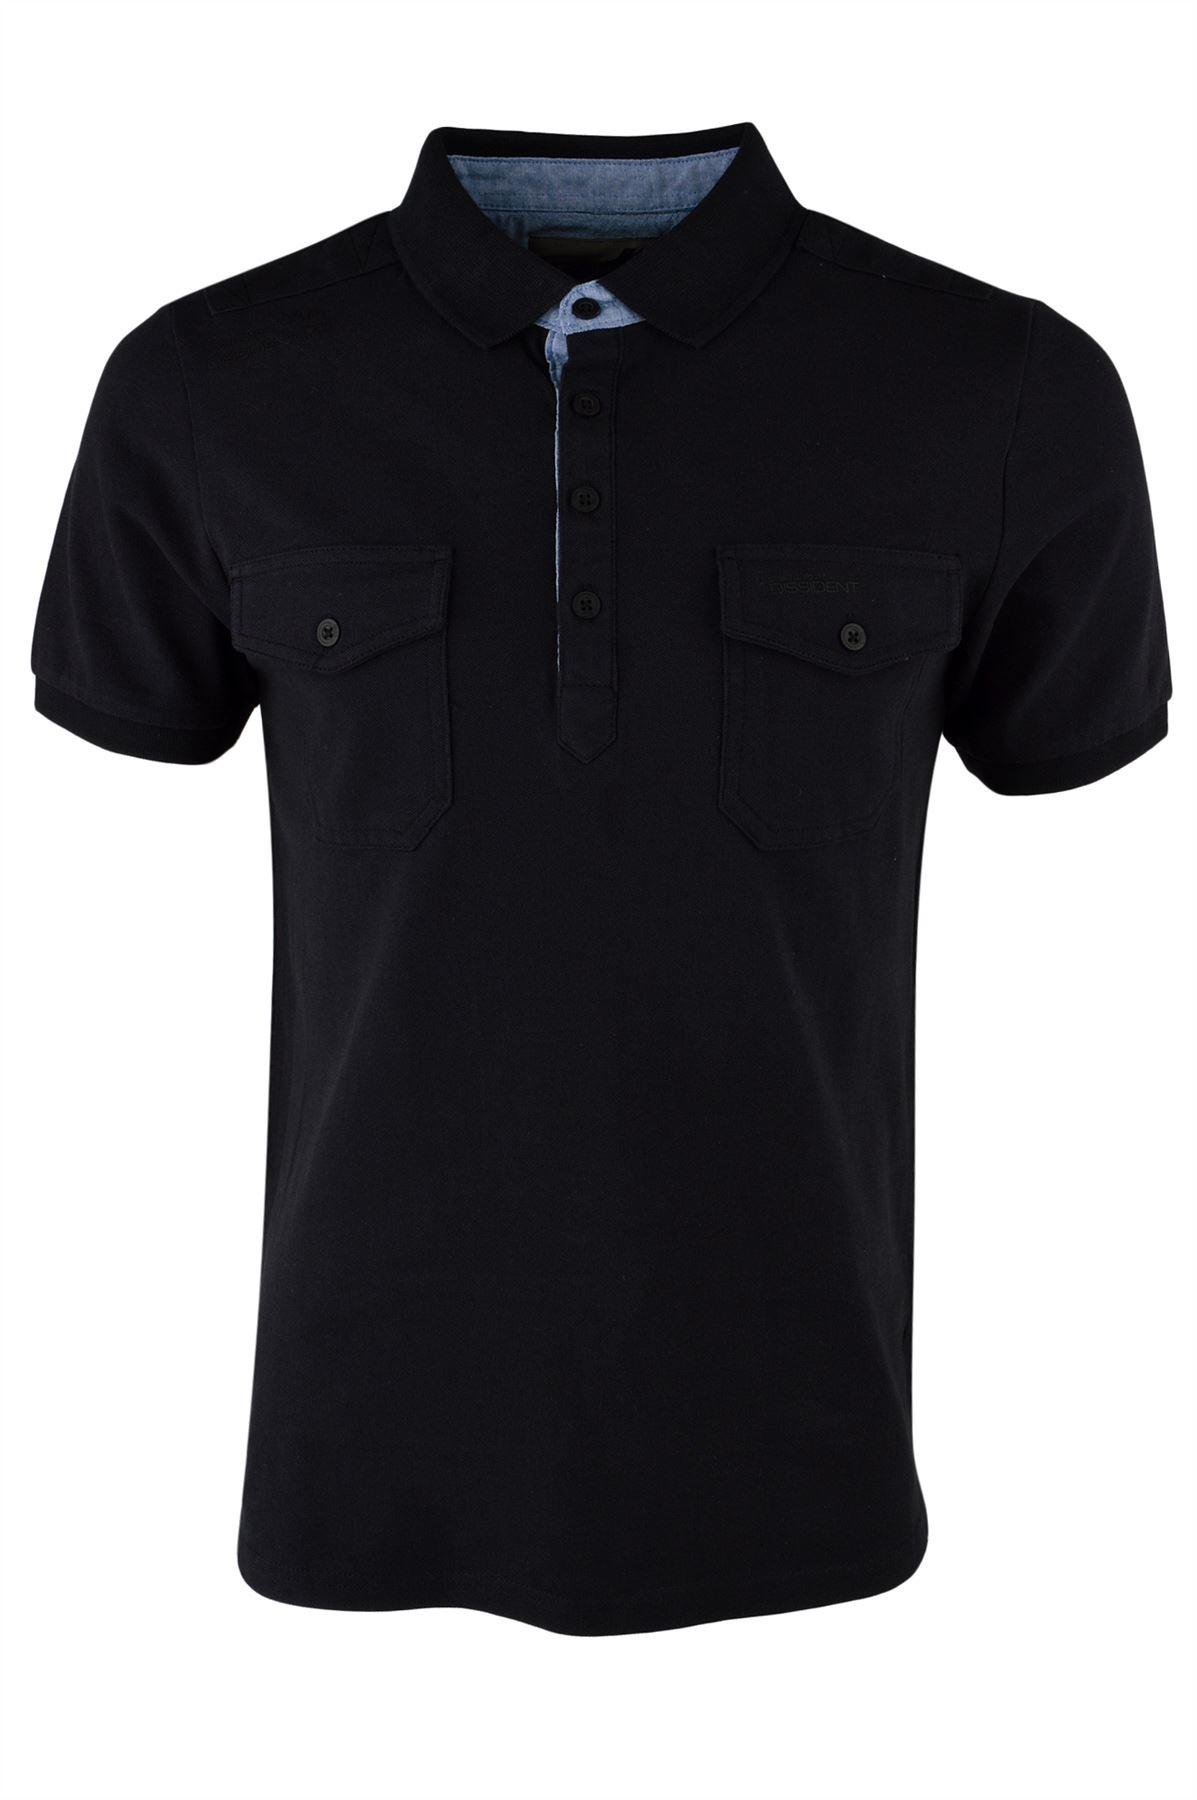 Dissident men 39 s zenith 2 pocket pique polo shirt ebay for Men s cotton polo shirts with pocket